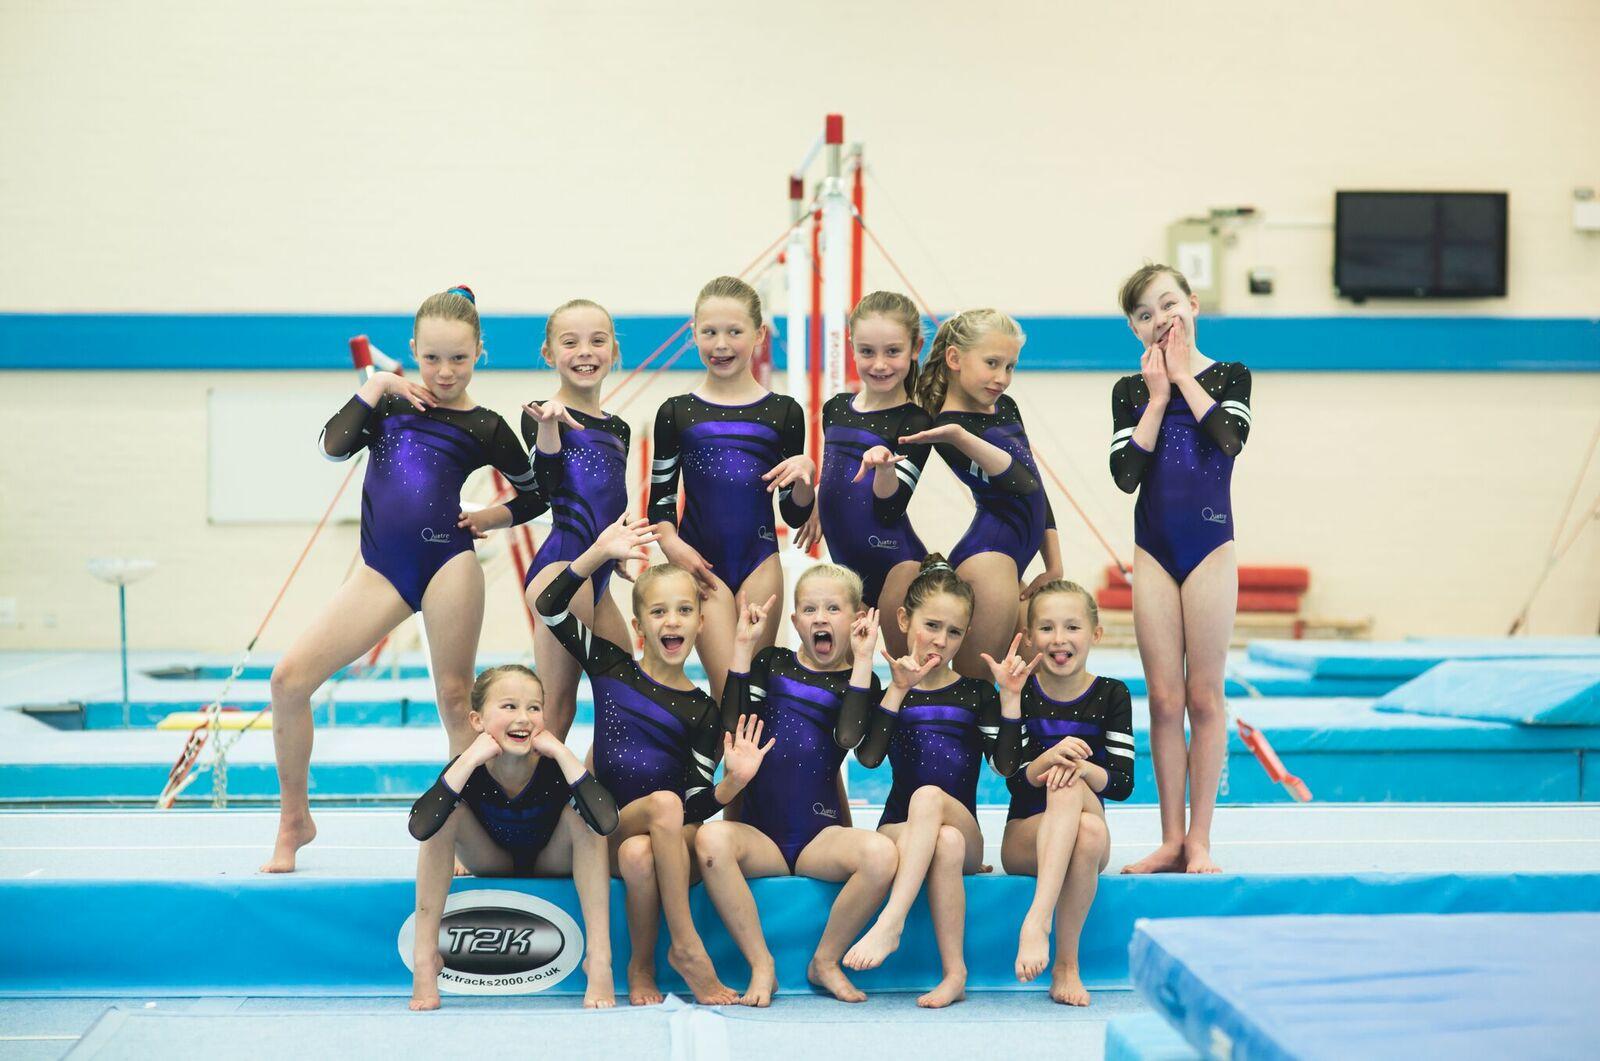 sports fitness and fun gymnastics meet